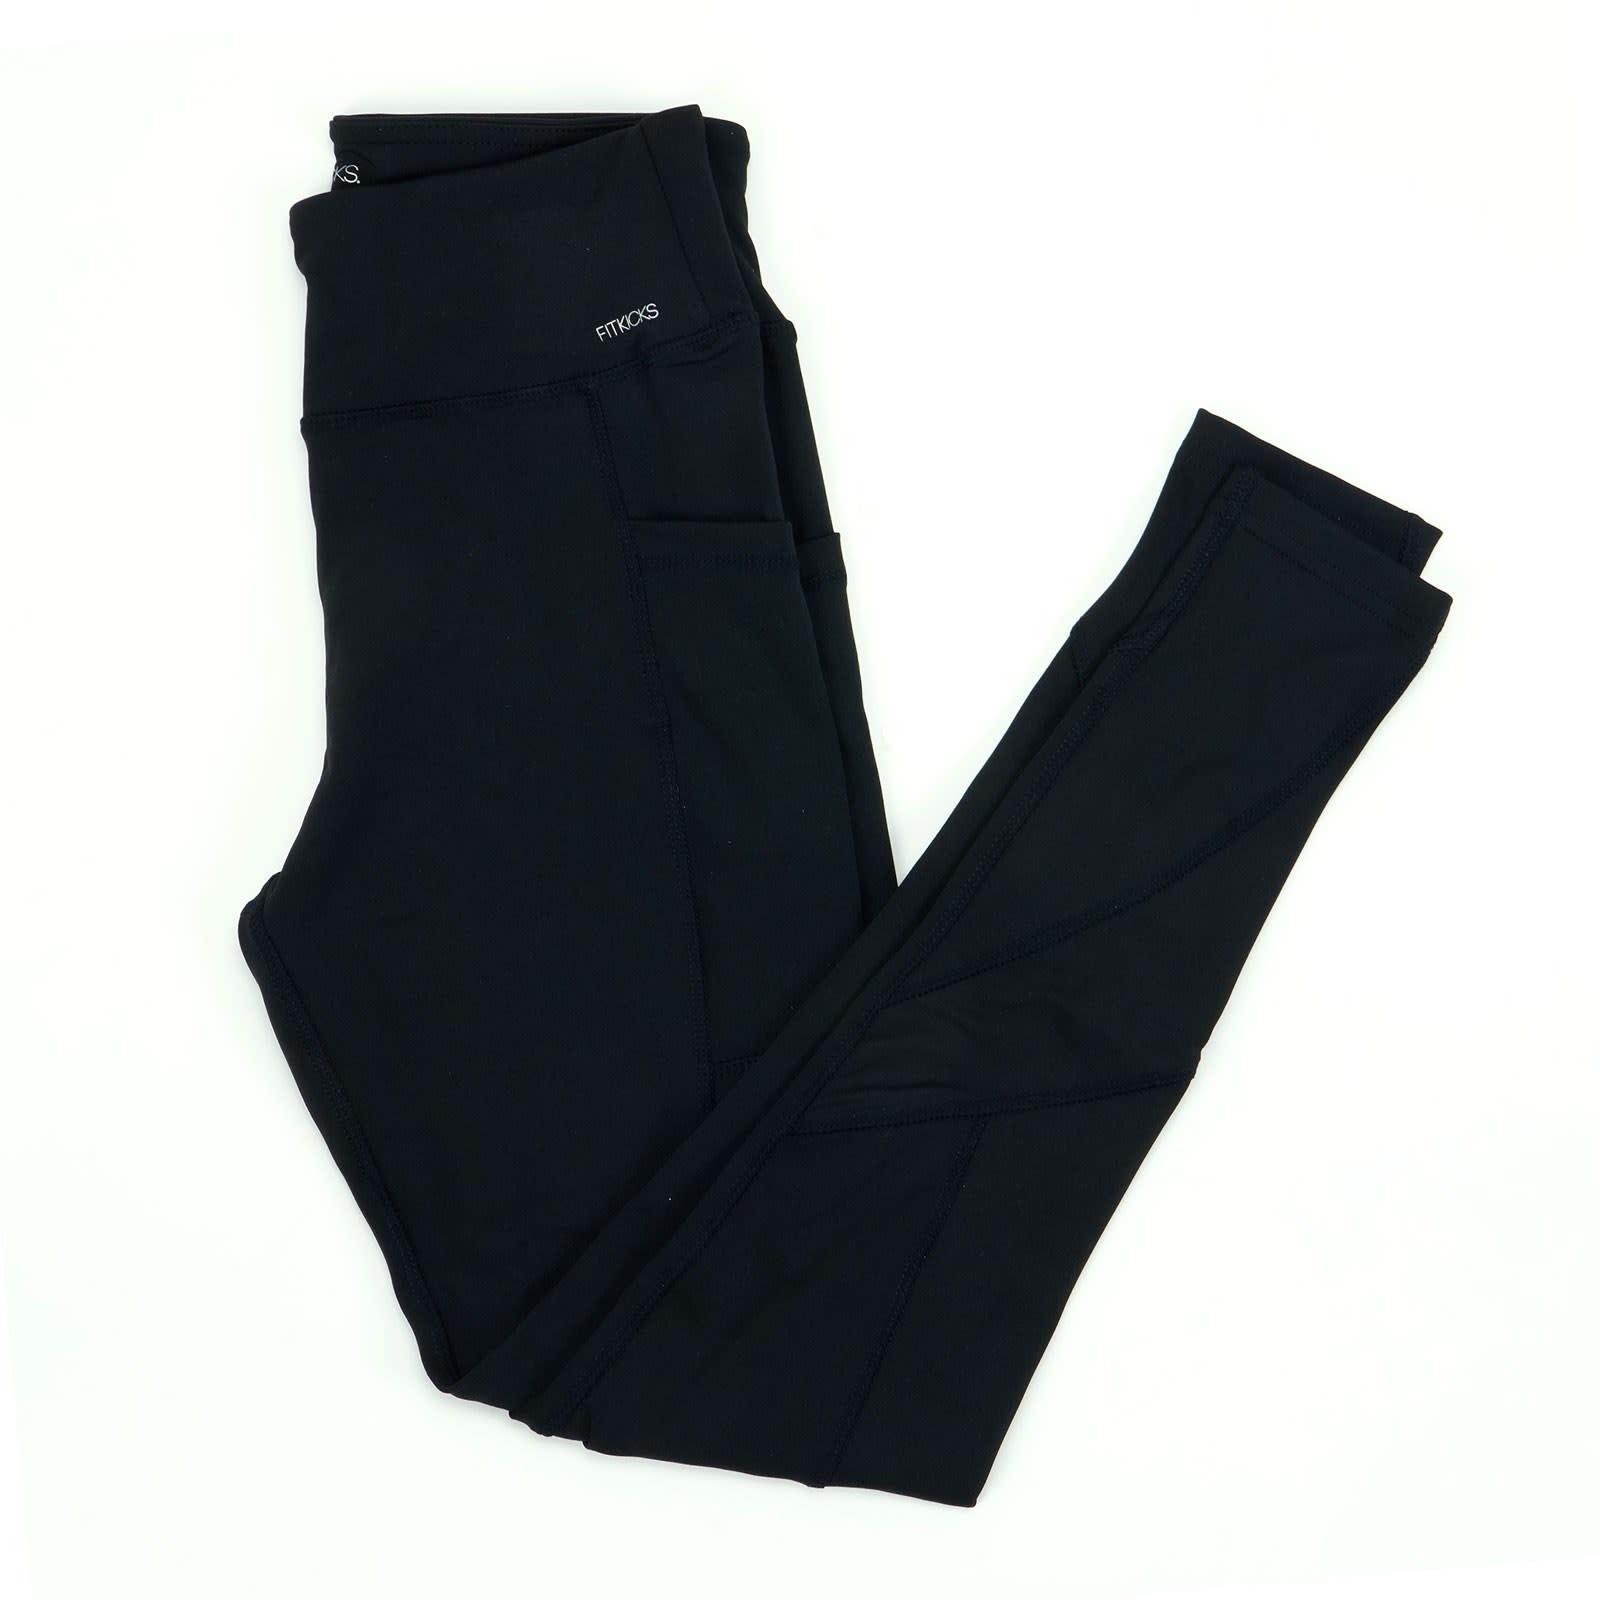 FitKicks Active Lifestyle Pocket Leggings